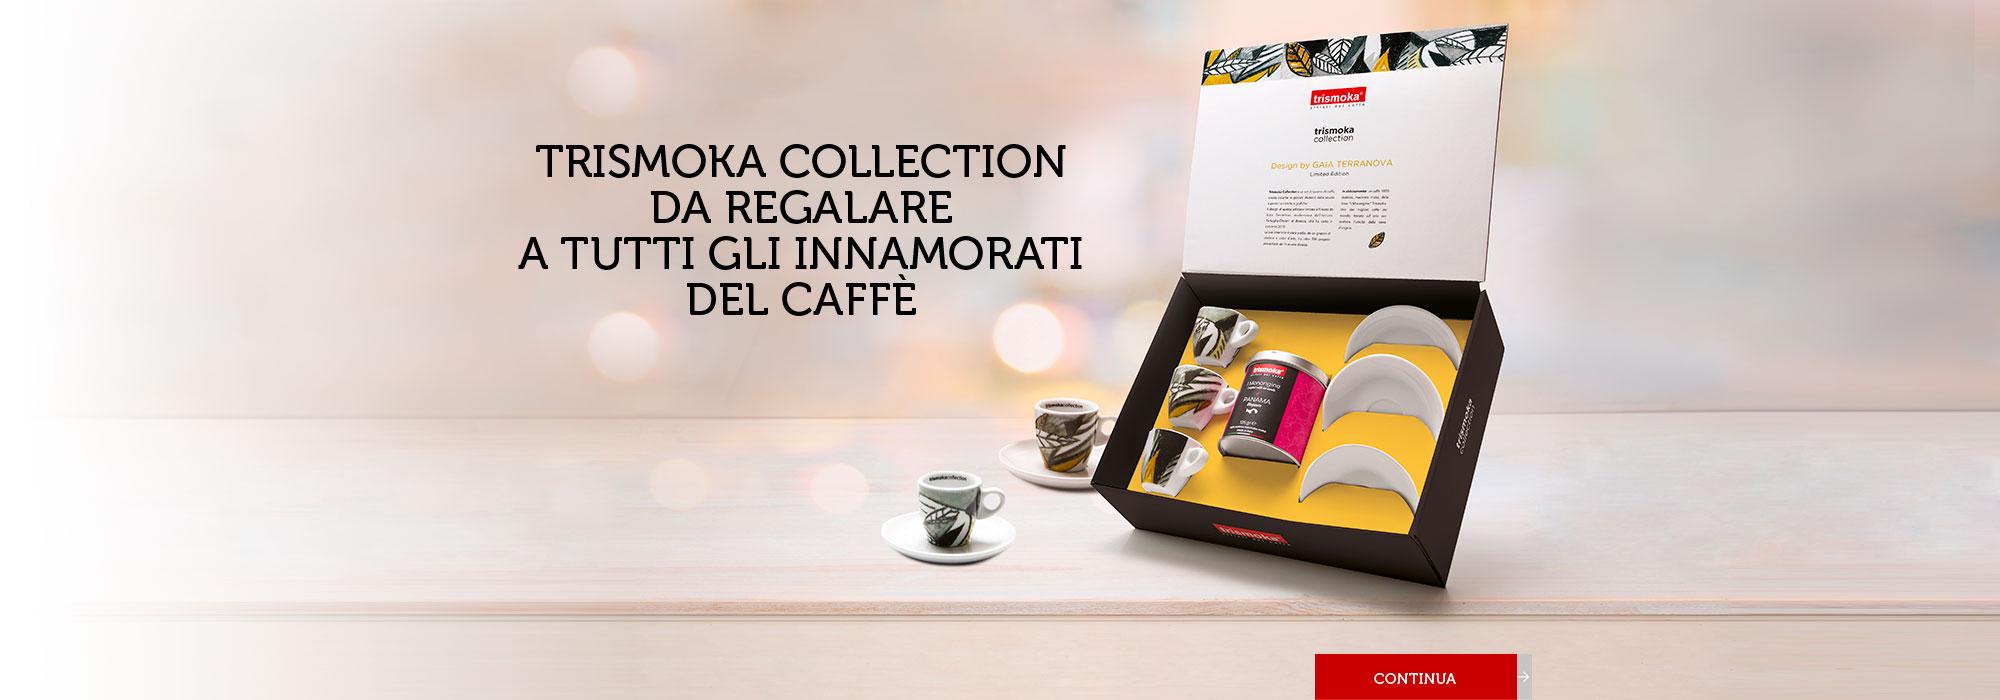 Trismoka Collection